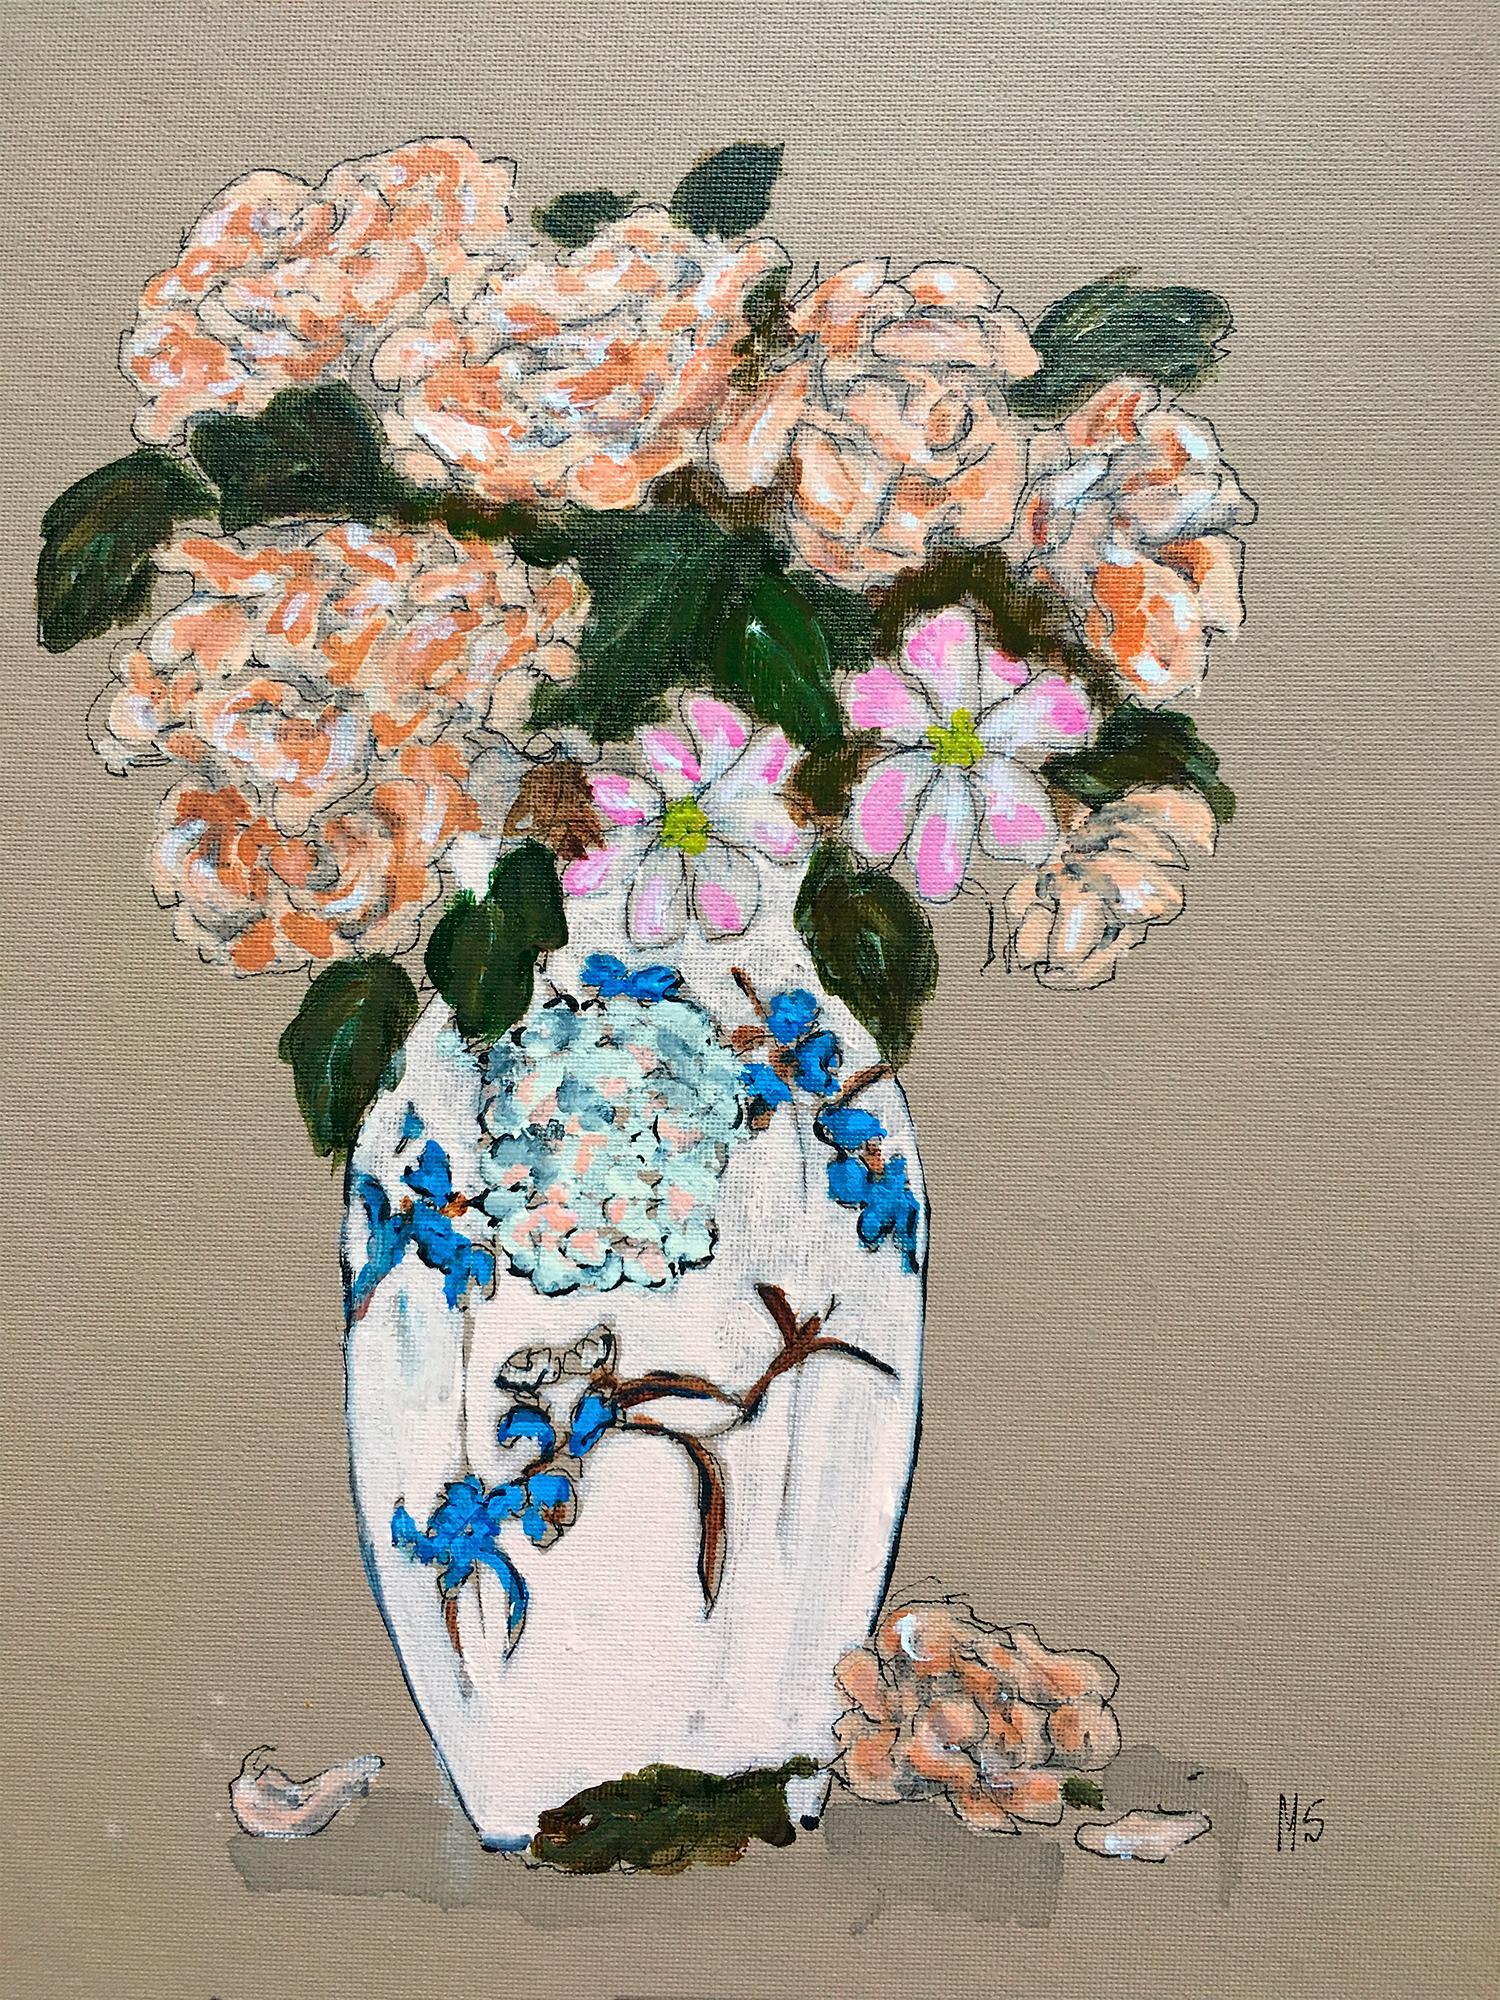 Flowers on Japanese cloissone vase, One of a Kind